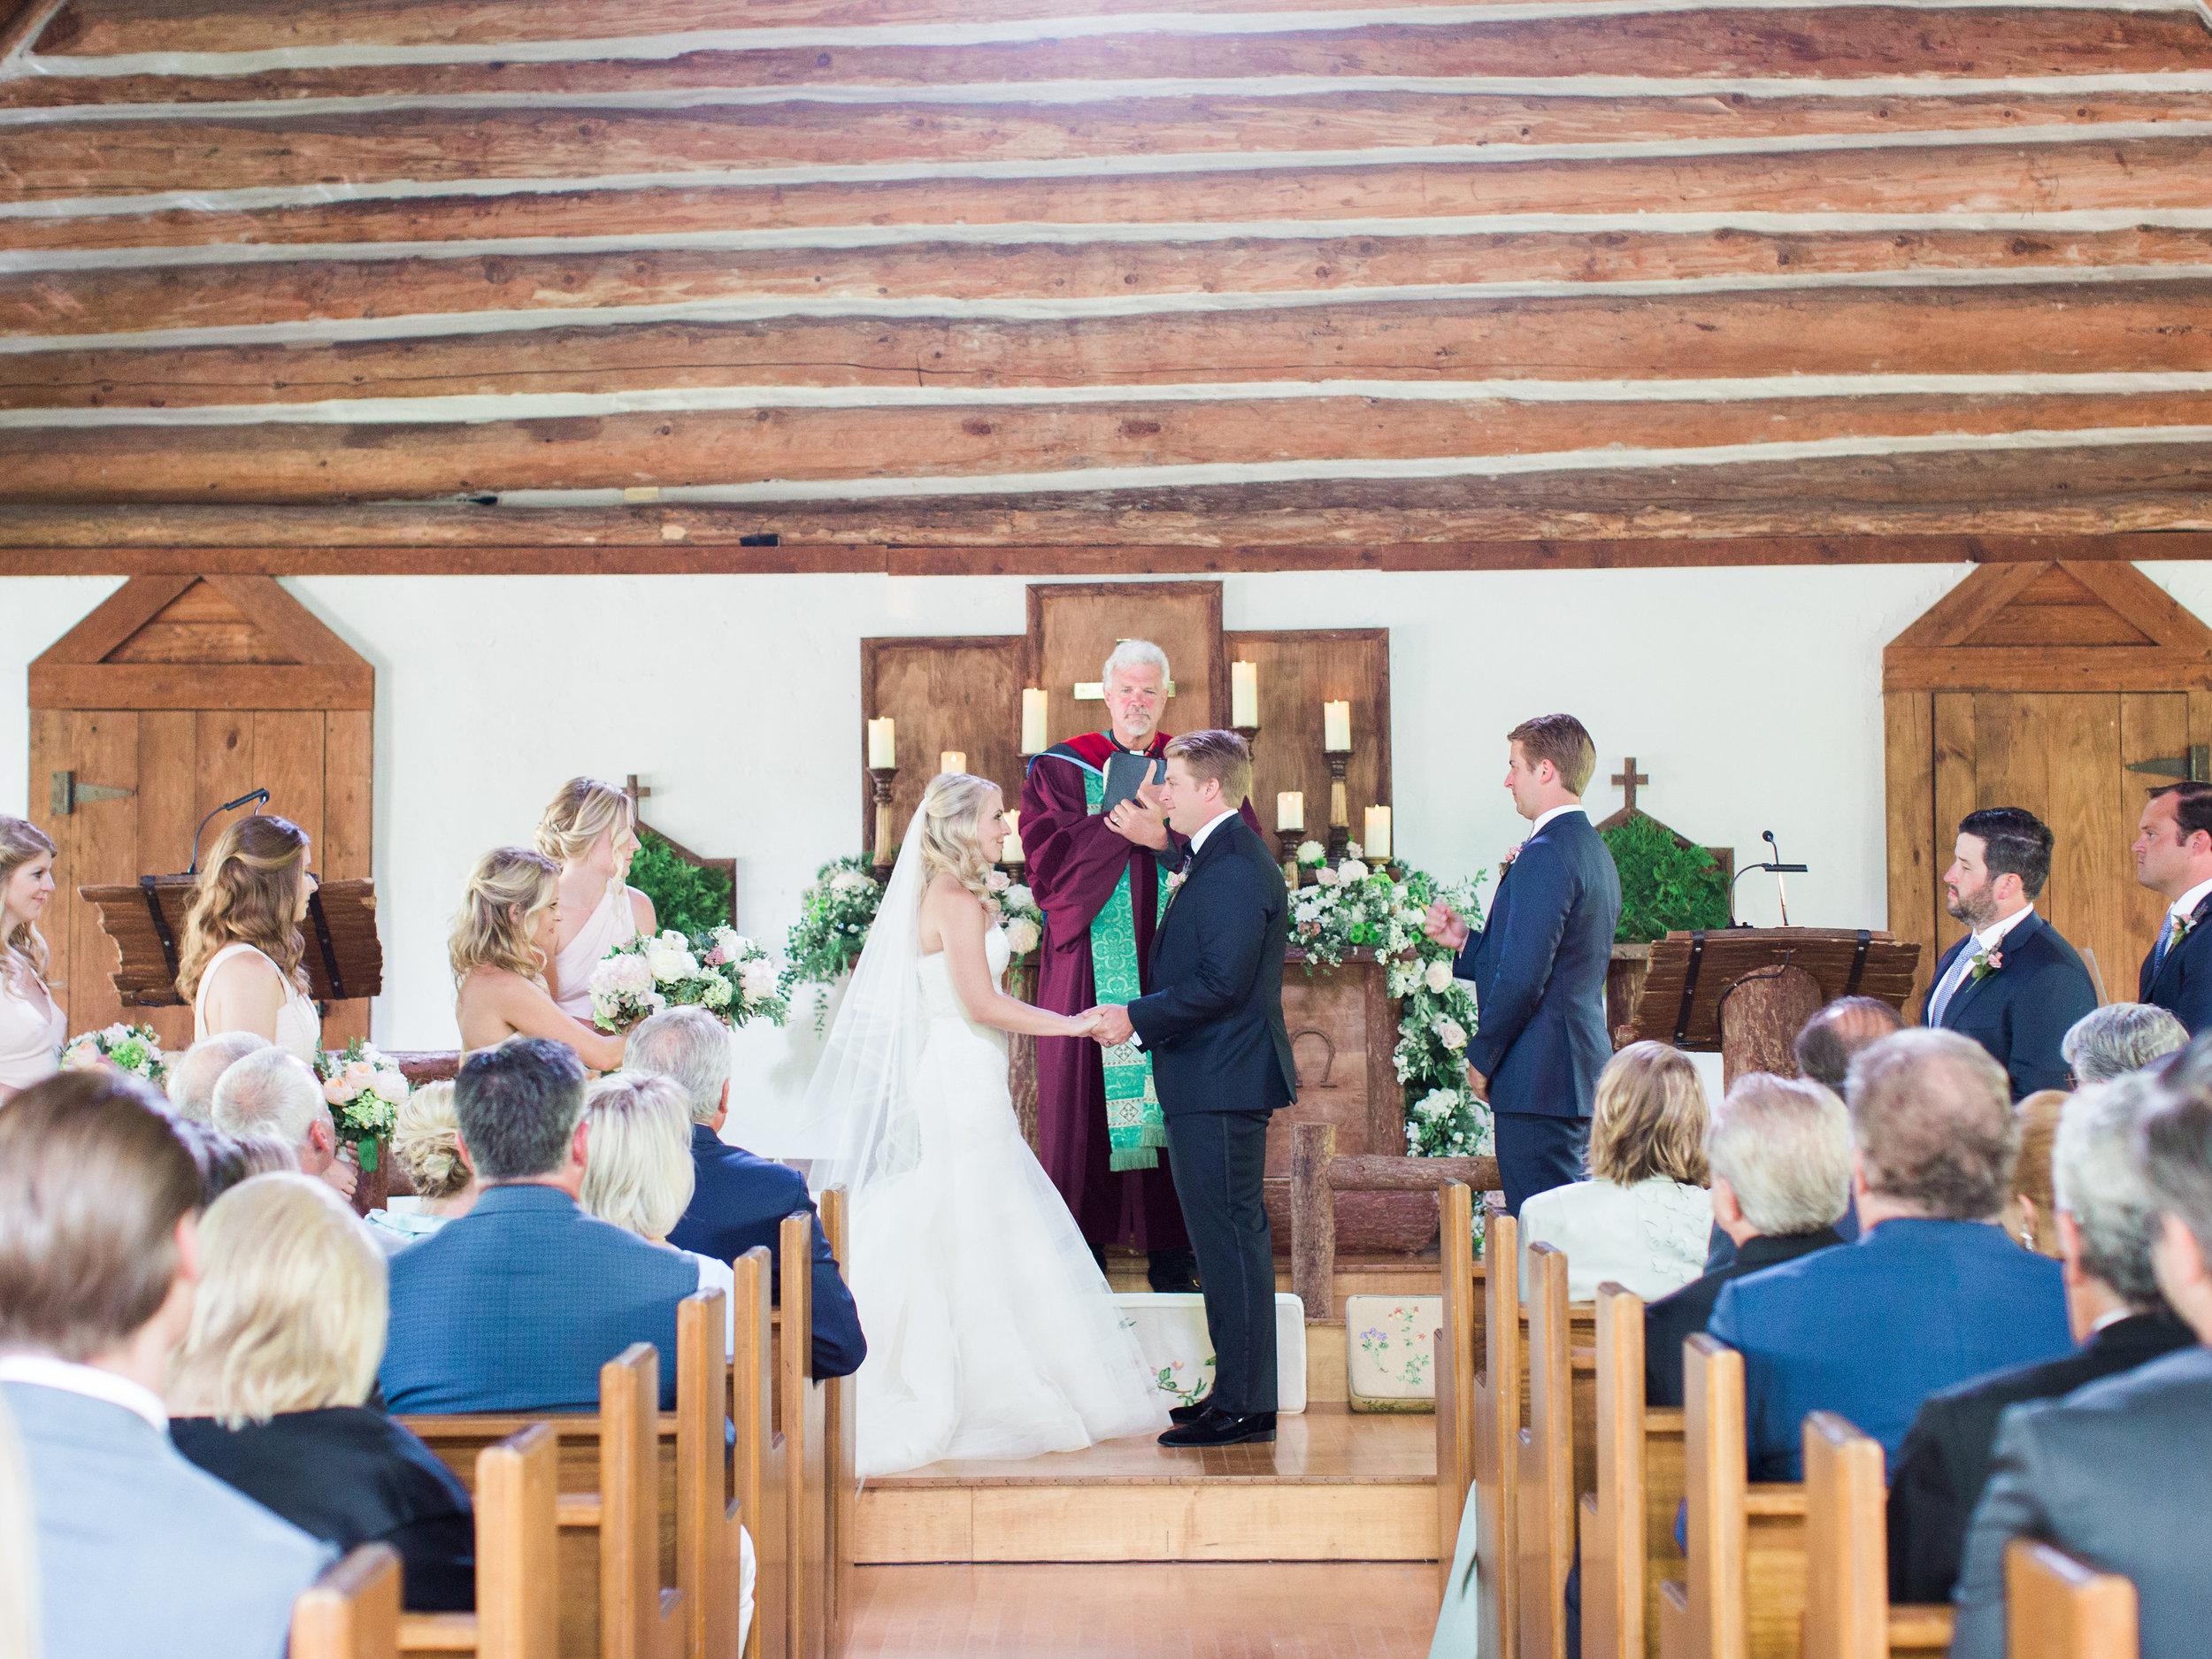 Coffman+Wedding+Ceremony-82.jpg